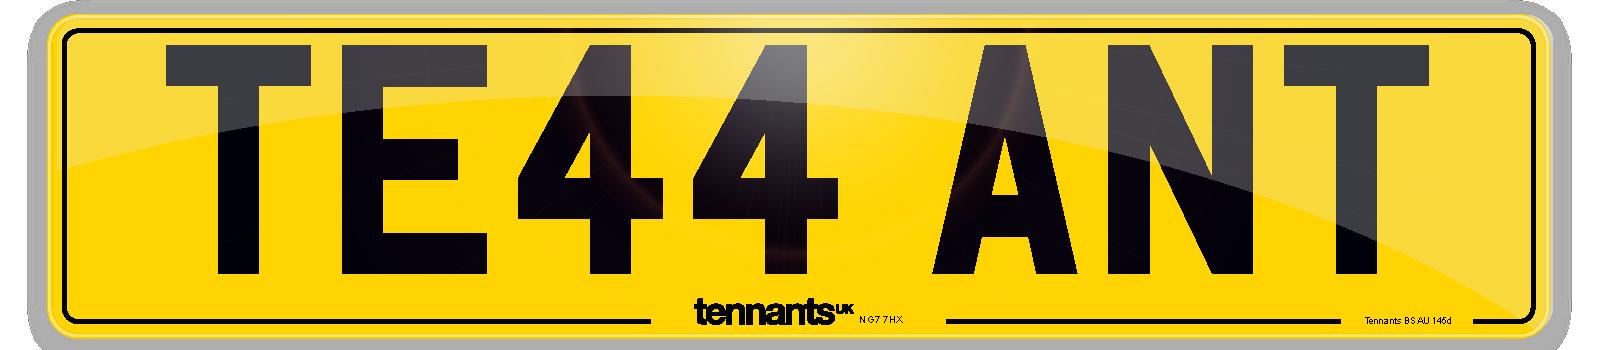 Standard rear number plate